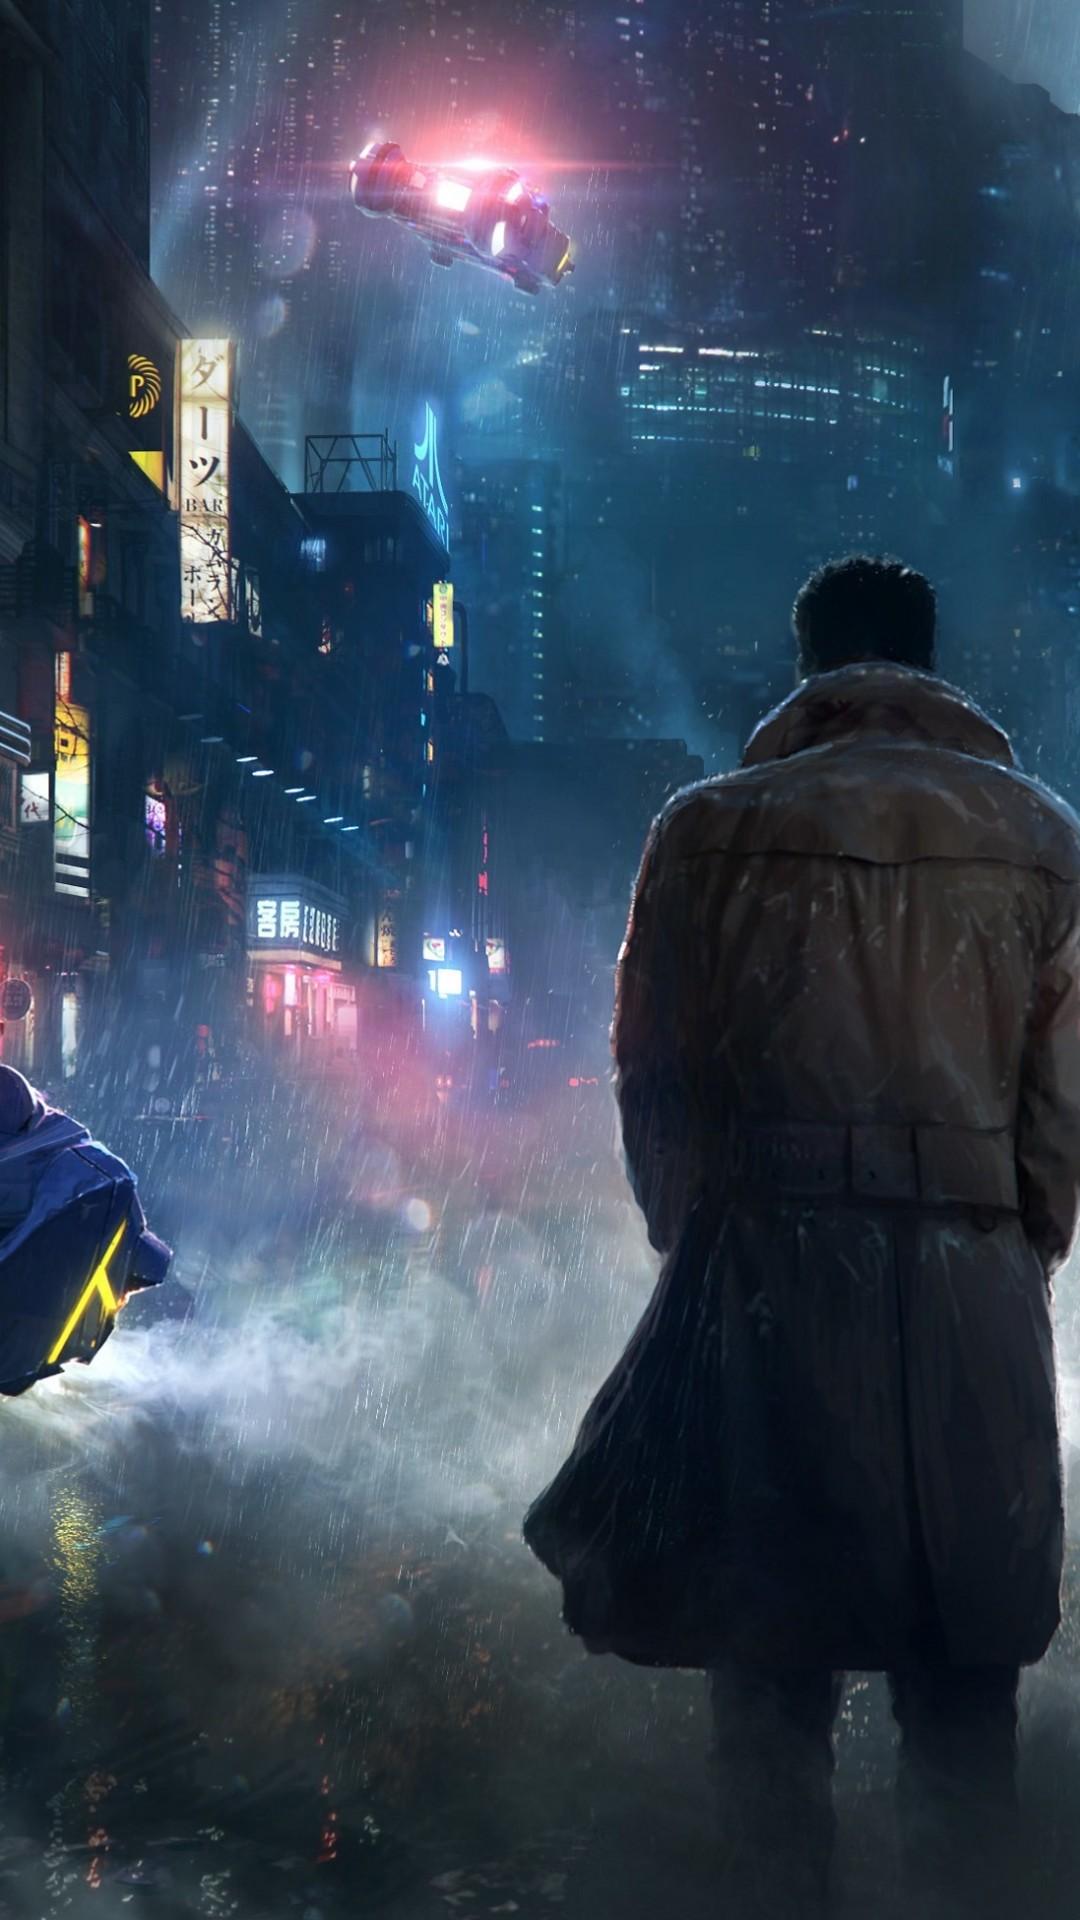 Wallpaper Blade Runner 2049 Art Best Movies Movies 12874